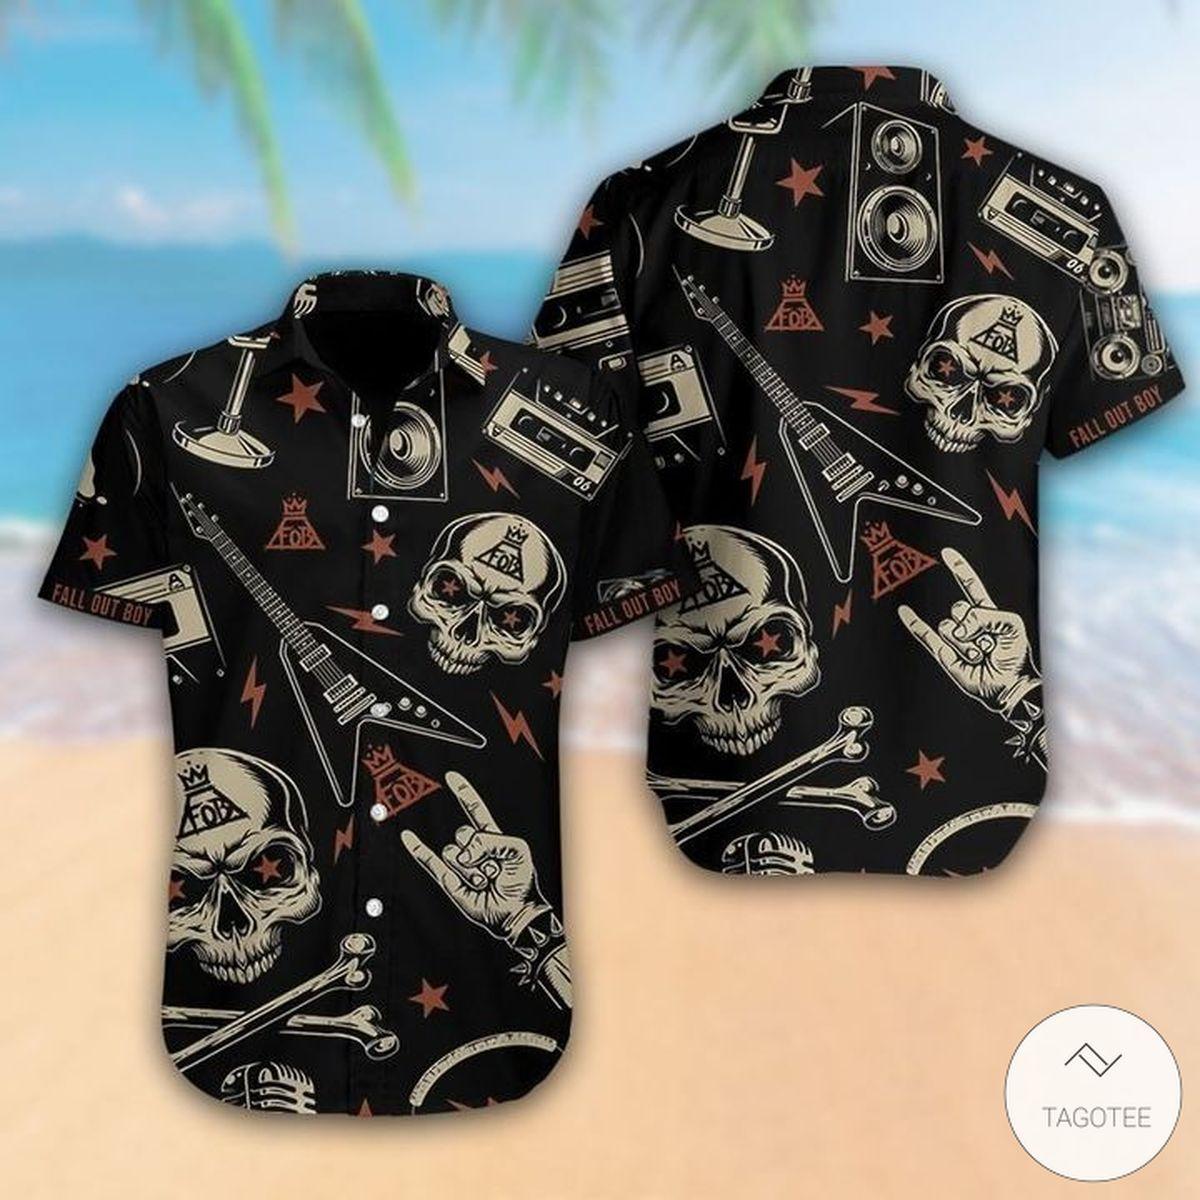 Fall Out Boy Hawaiian Shirt